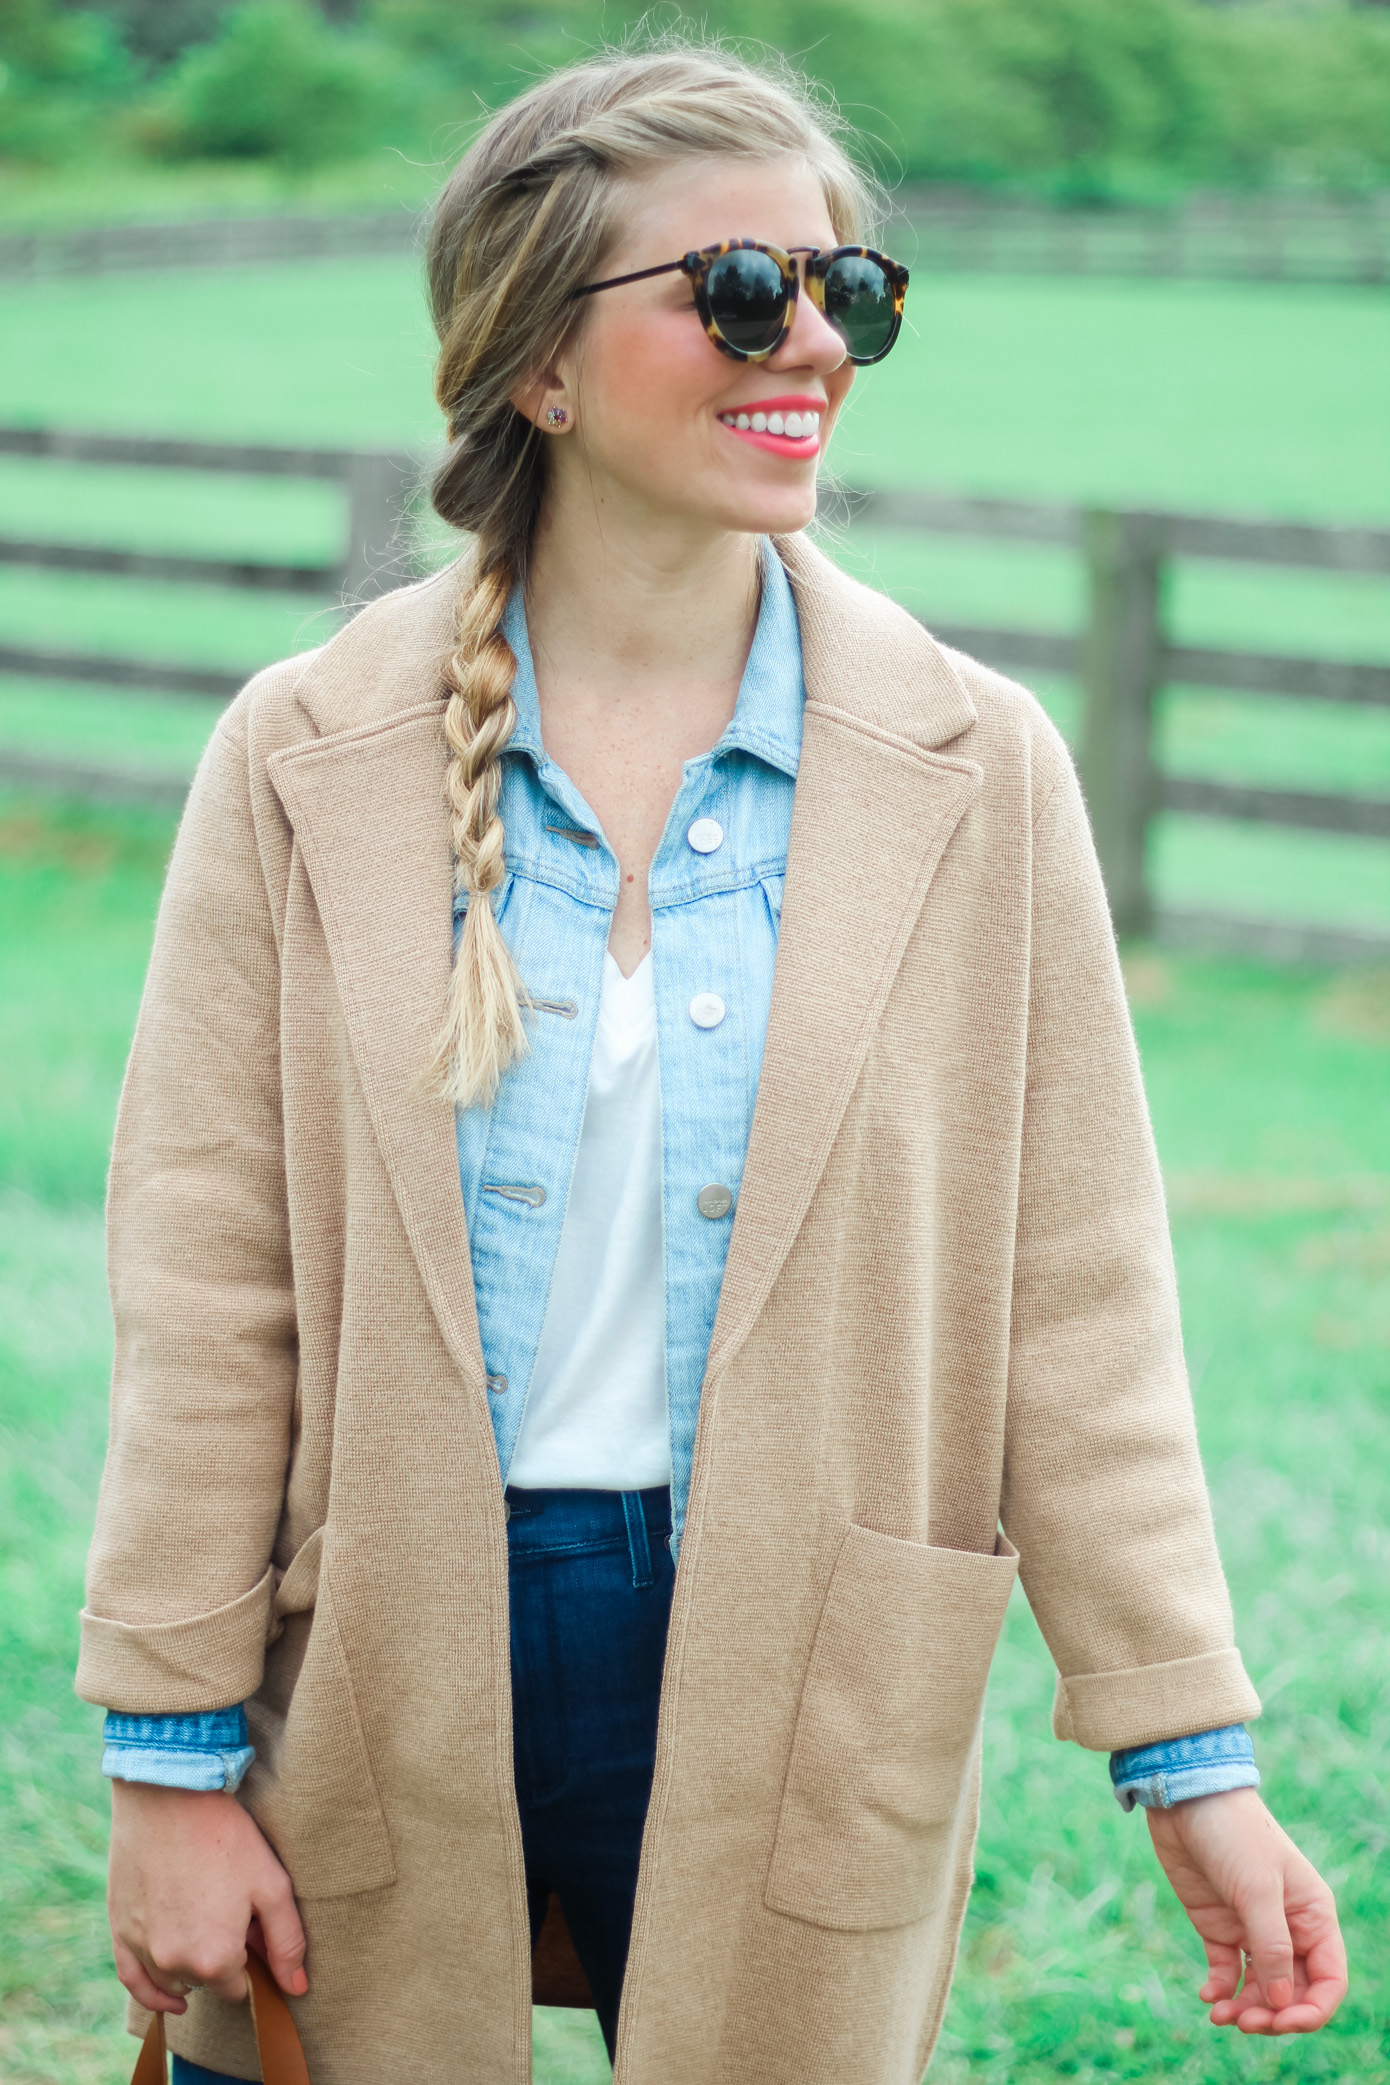 J.Crew Sweater Blazer | Fall Layering | Louella Reese Life & Style Blogger